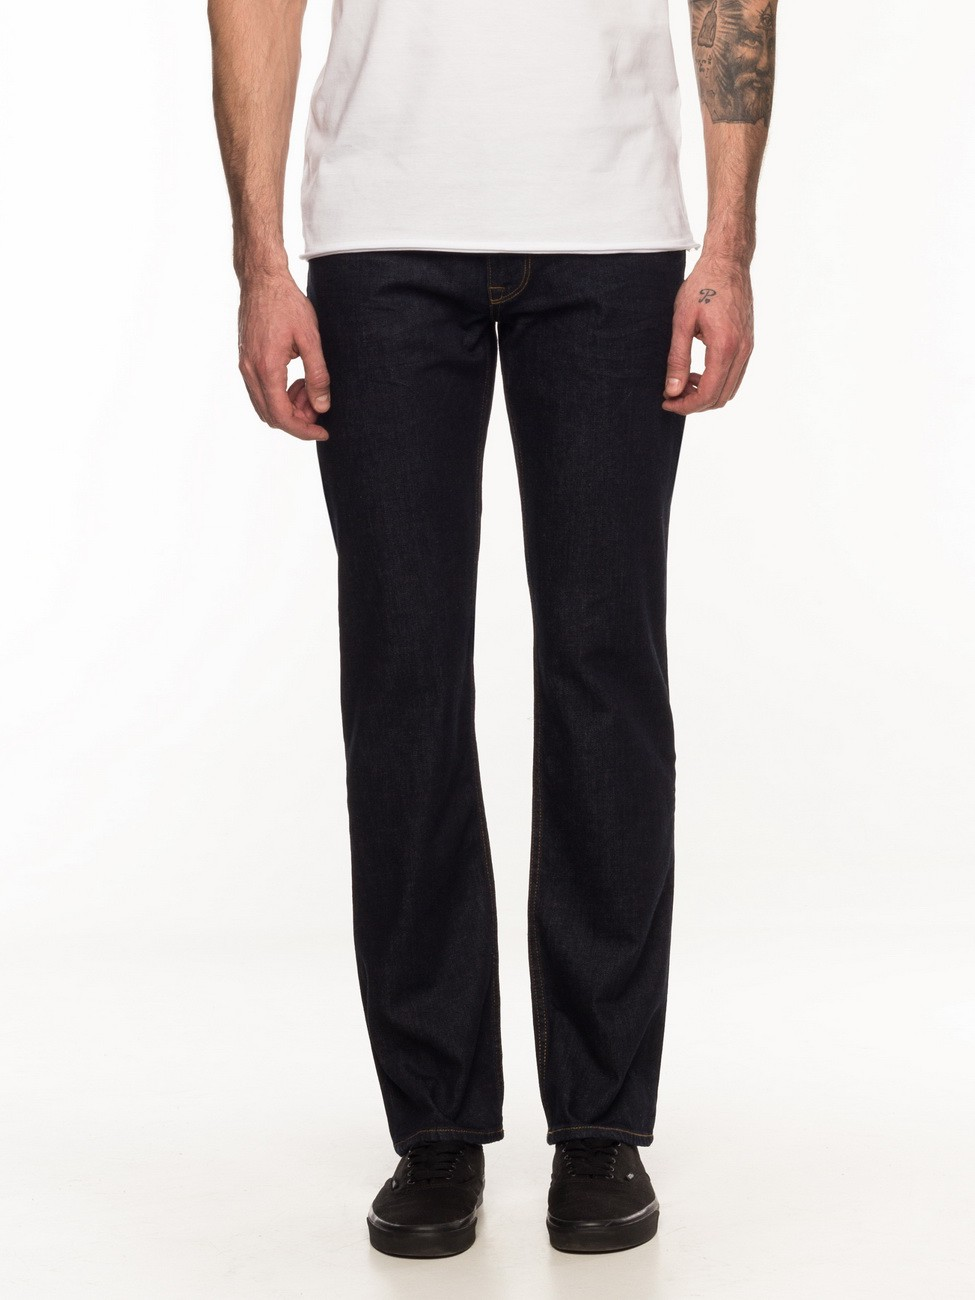 cross herren jeans antonio relax fit rinsed kaufen jeans direct de. Black Bedroom Furniture Sets. Home Design Ideas